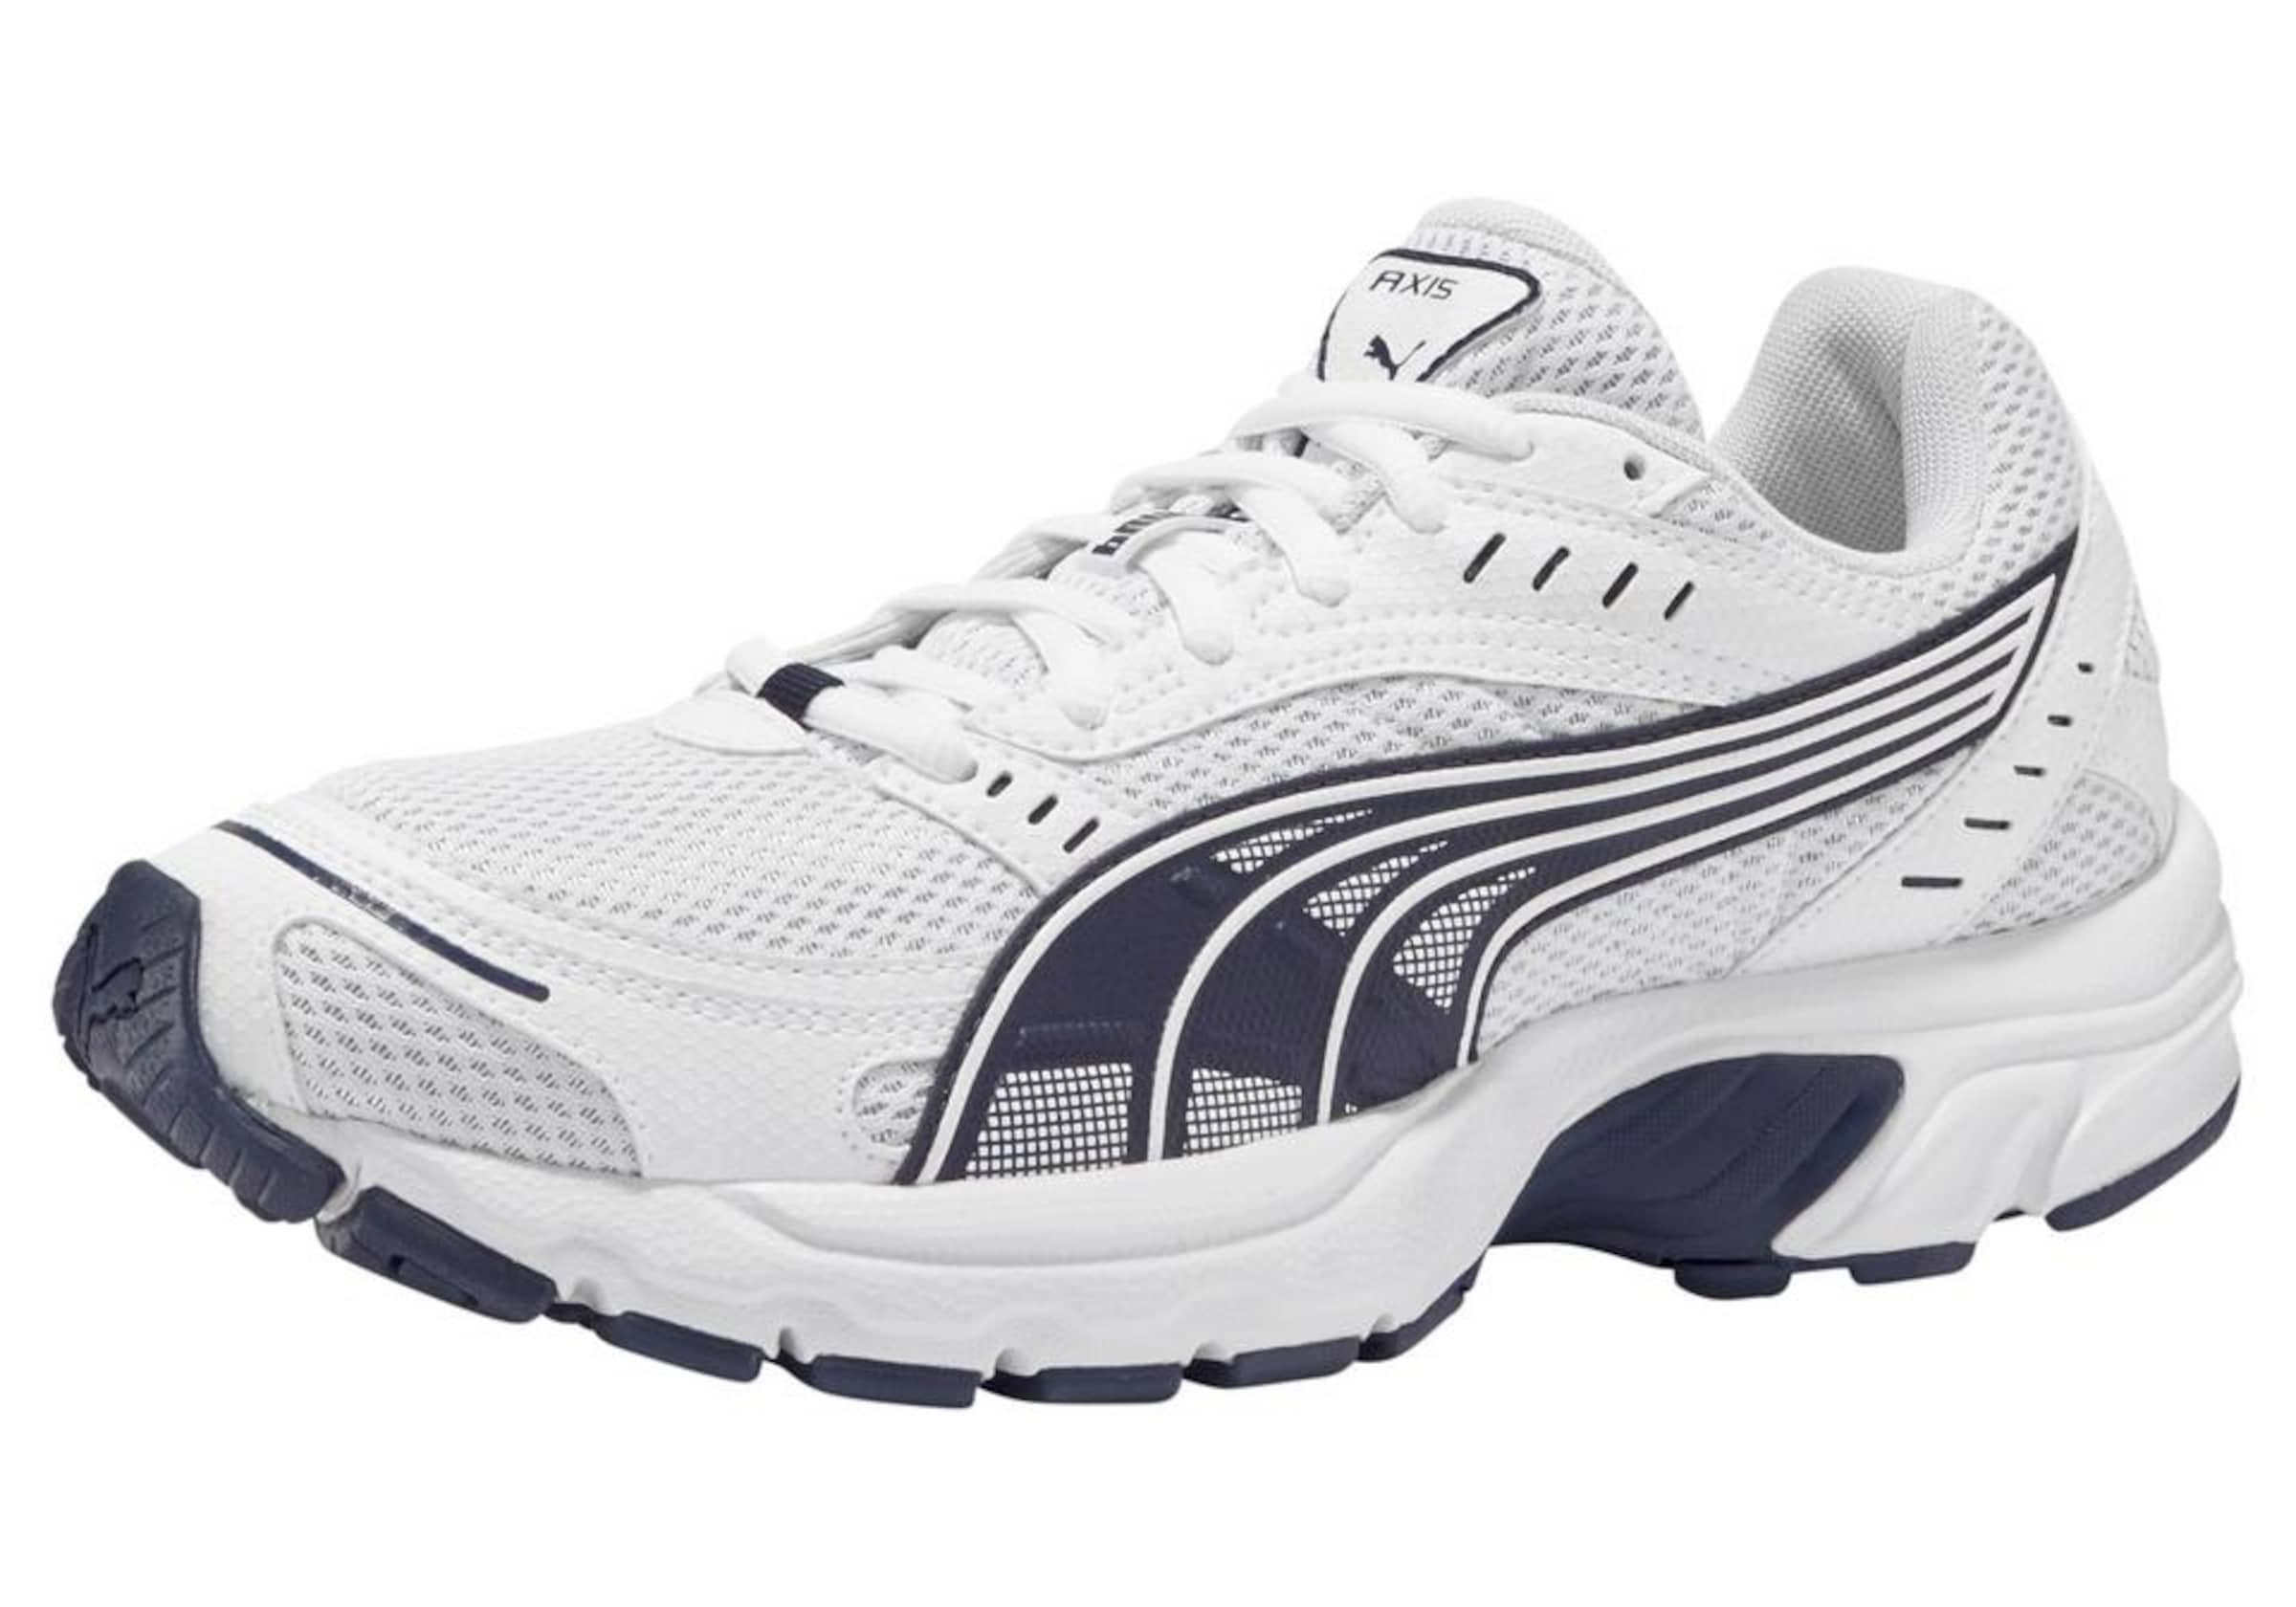 'axis' Puma Sneaker In 'axis' Puma Sneaker 'axis' Puma Dunkelblau Dunkelblau In Sneaker QCoWeBrdx